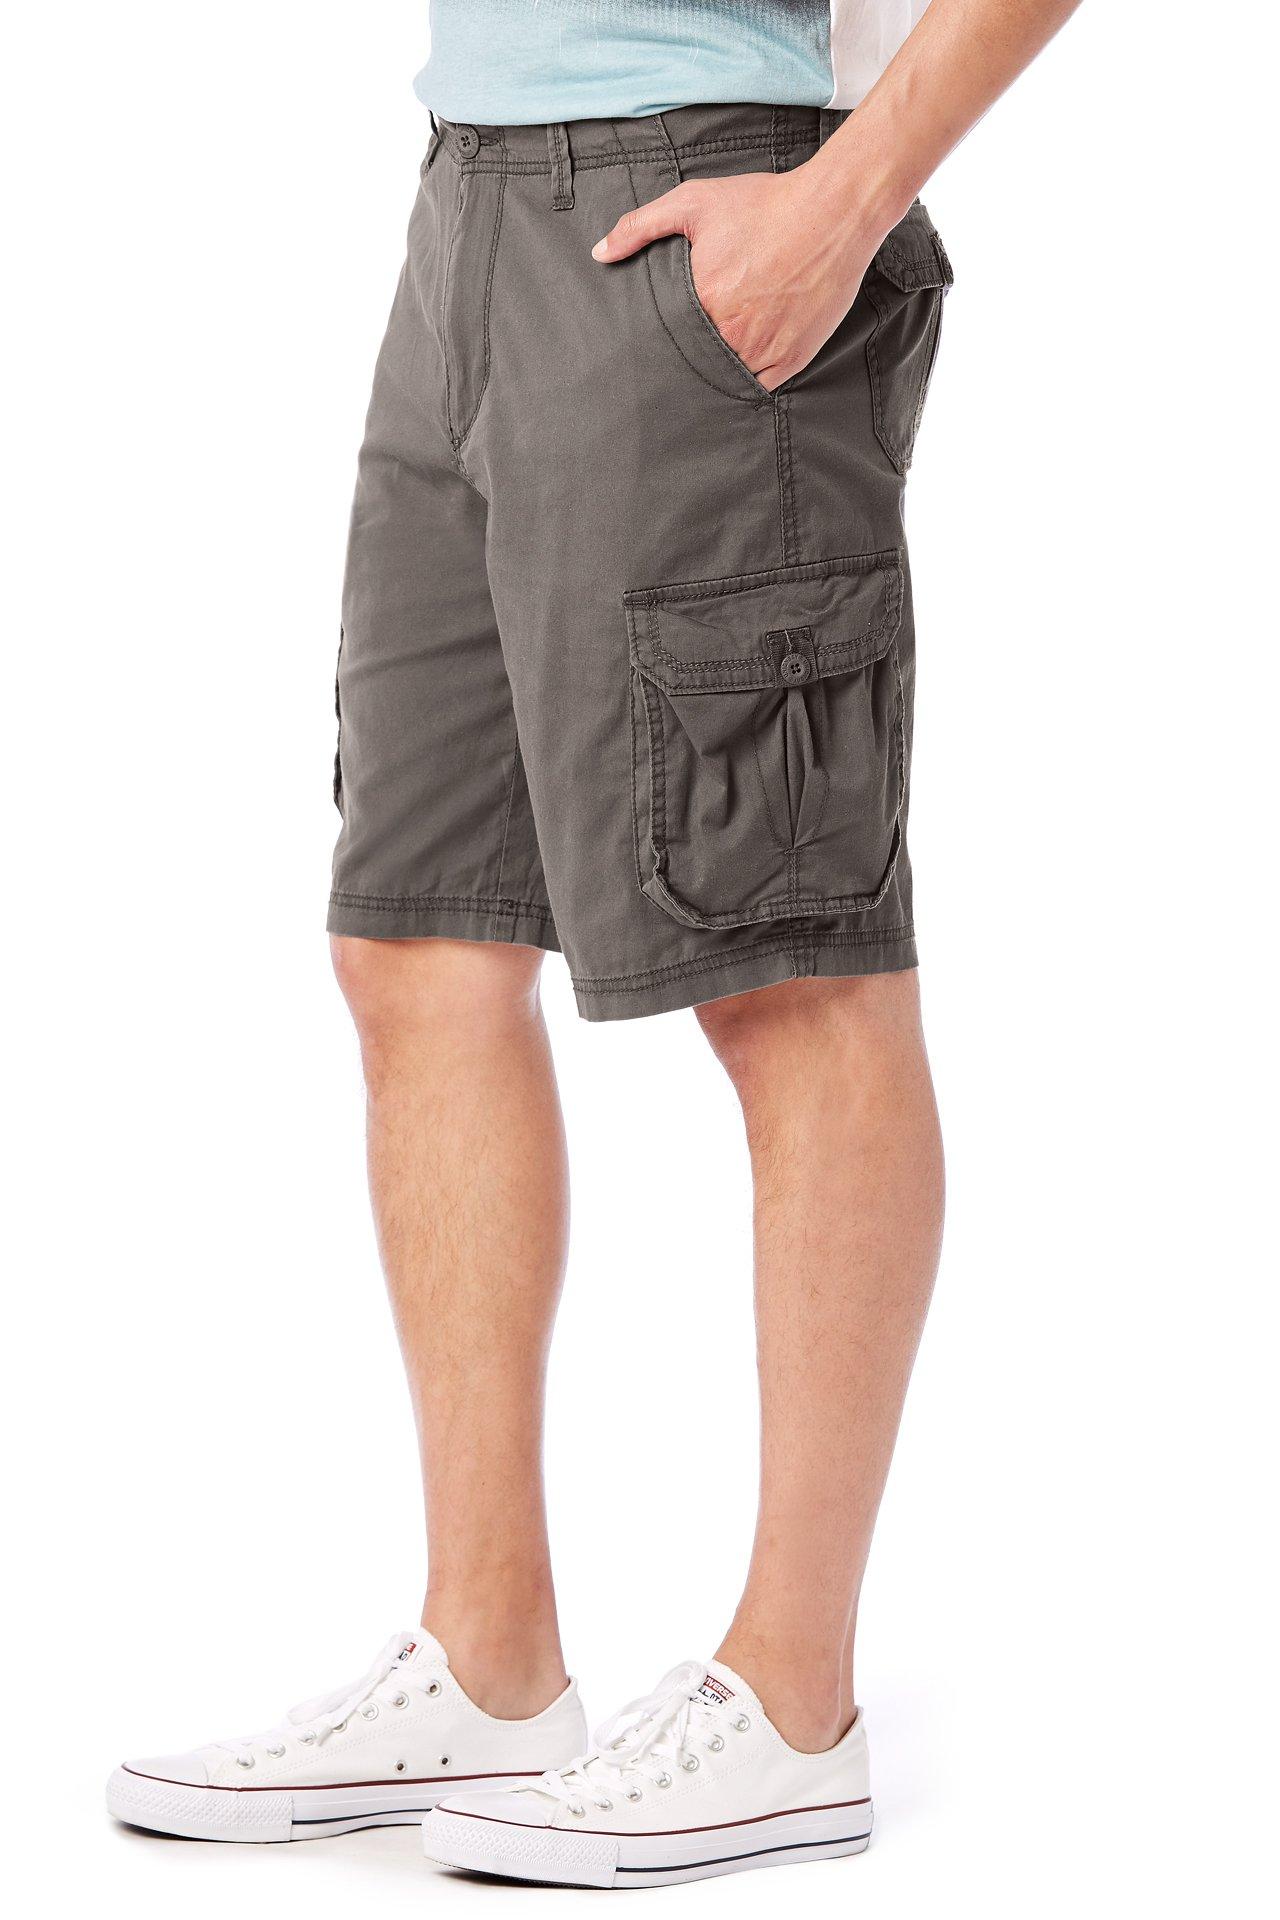 UNIONBAY Men's Stretch Fresh Twill Relaxed Fit Zipper Cargo Short, Flint, 38 by UNIONBAY (Image #4)